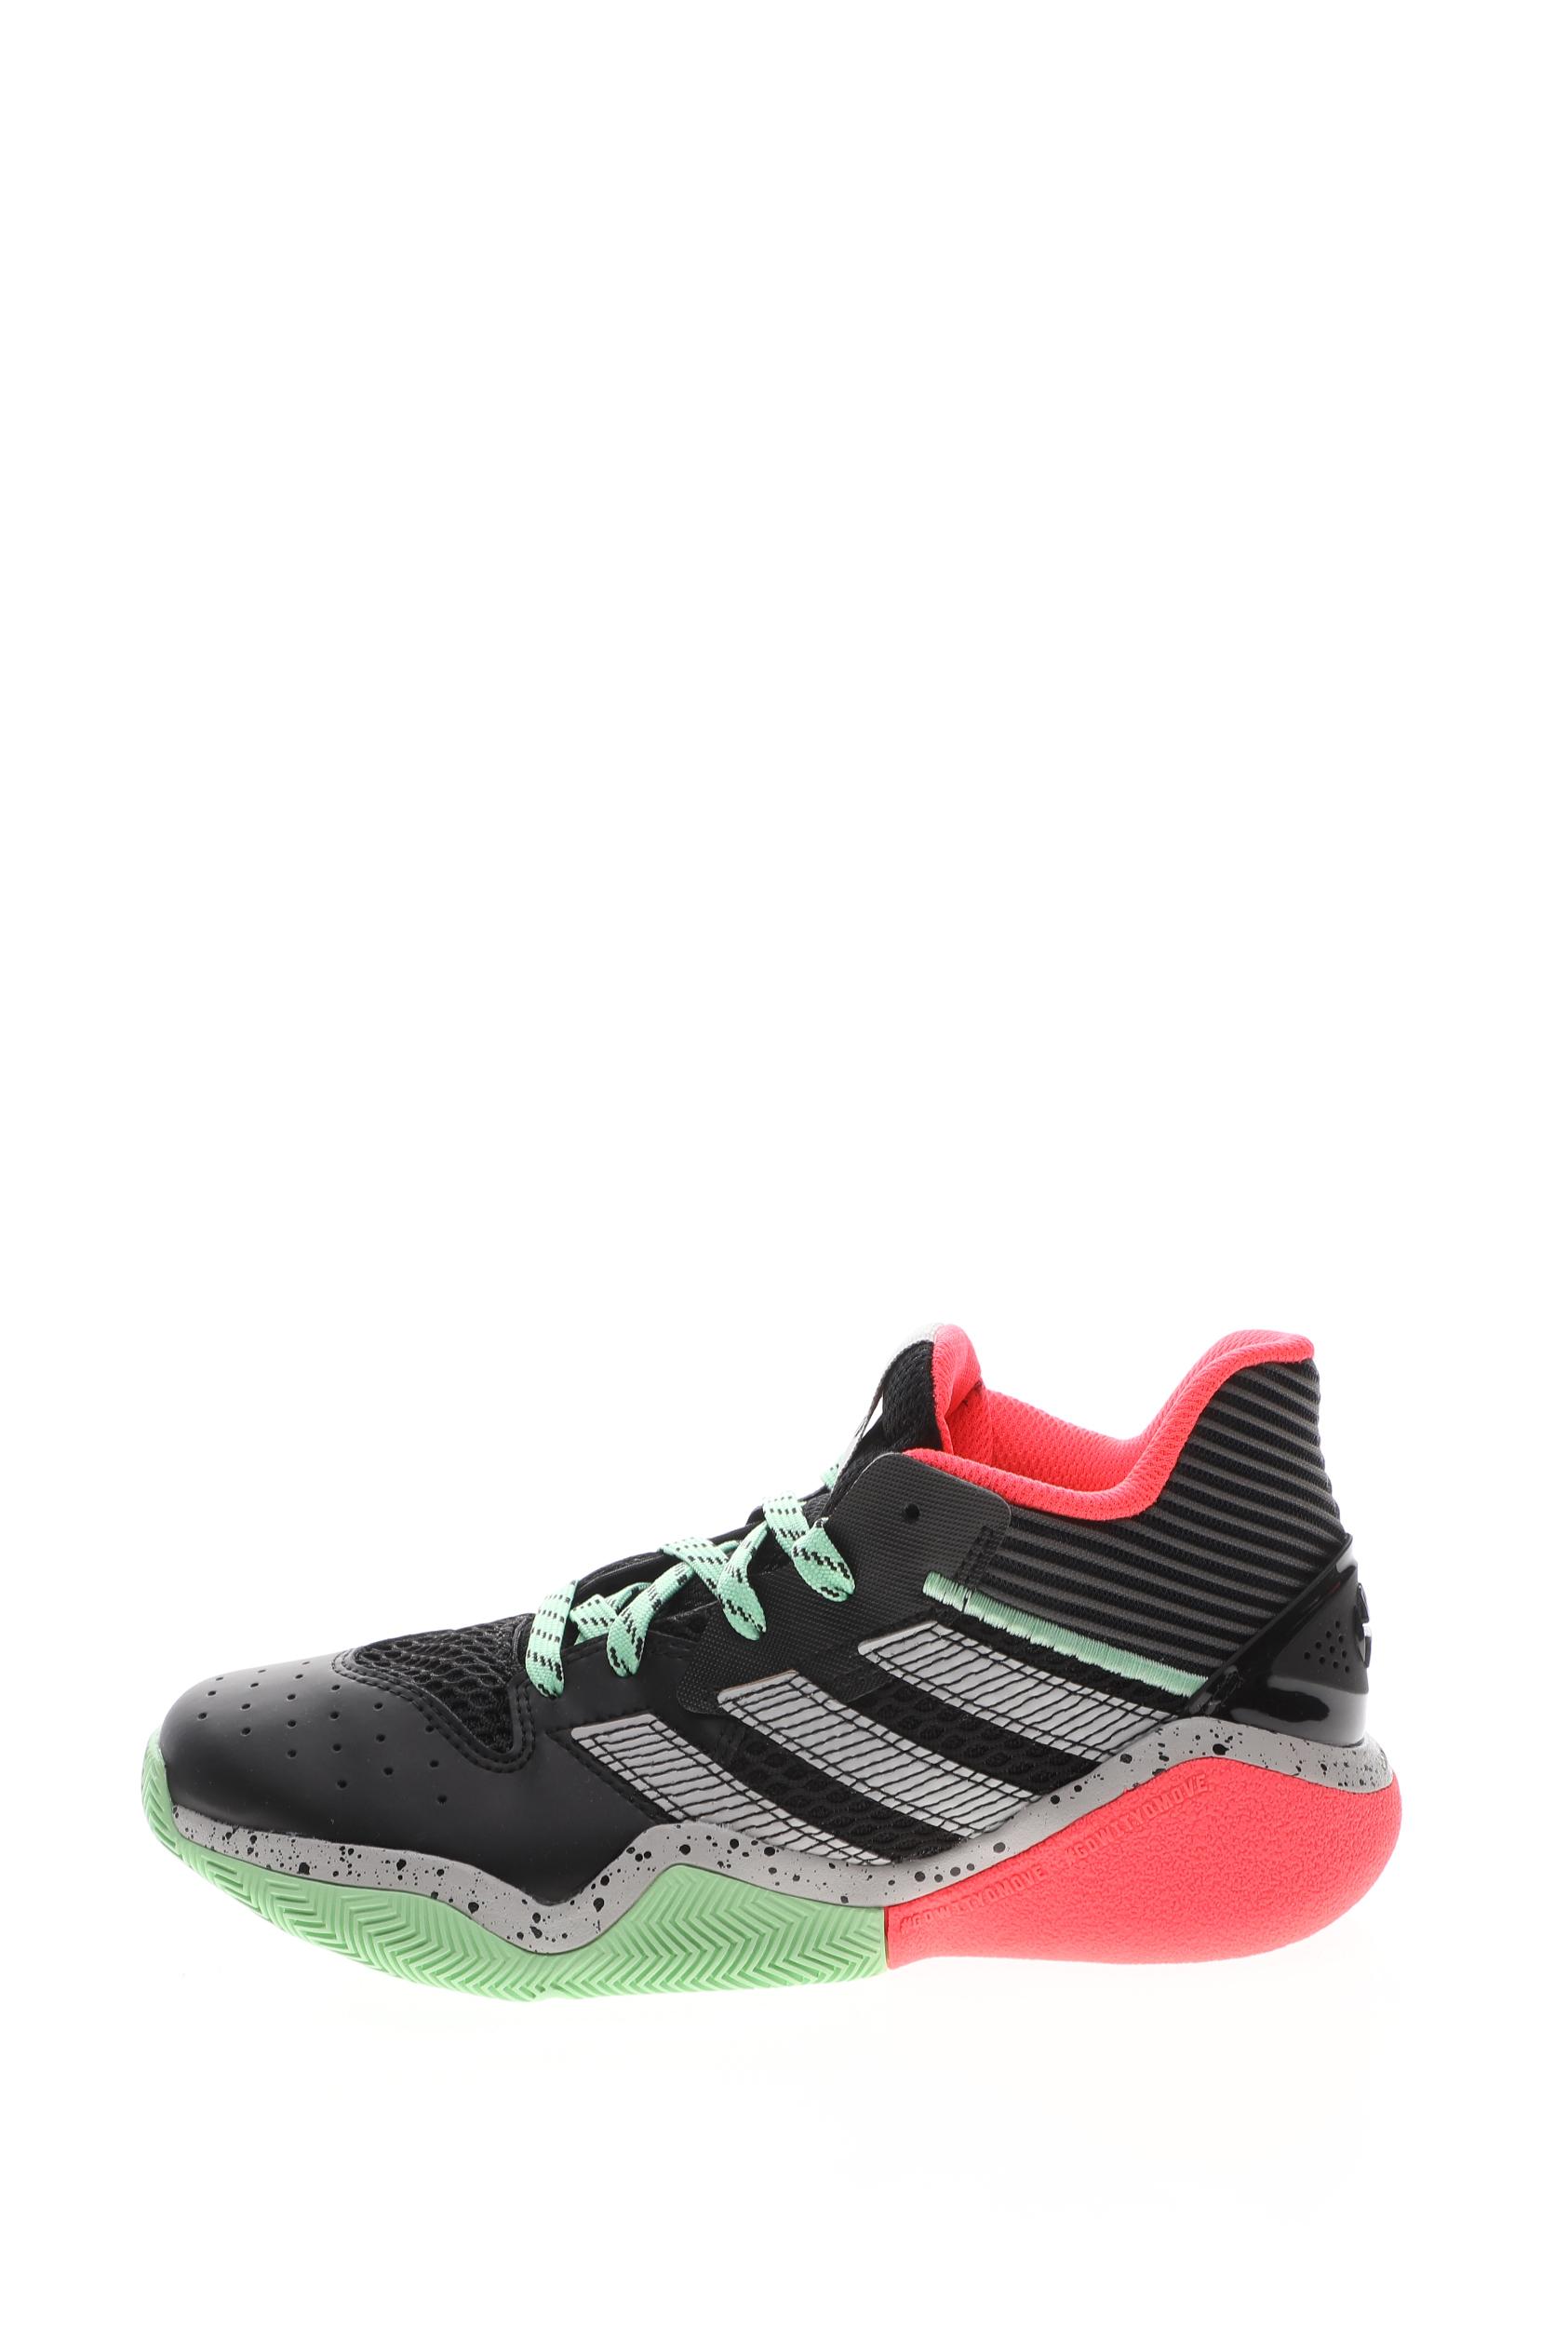 ADIDAS – Παιδικά παπούτσια μπάσκετ adidas Harden Stepback J μαύρα